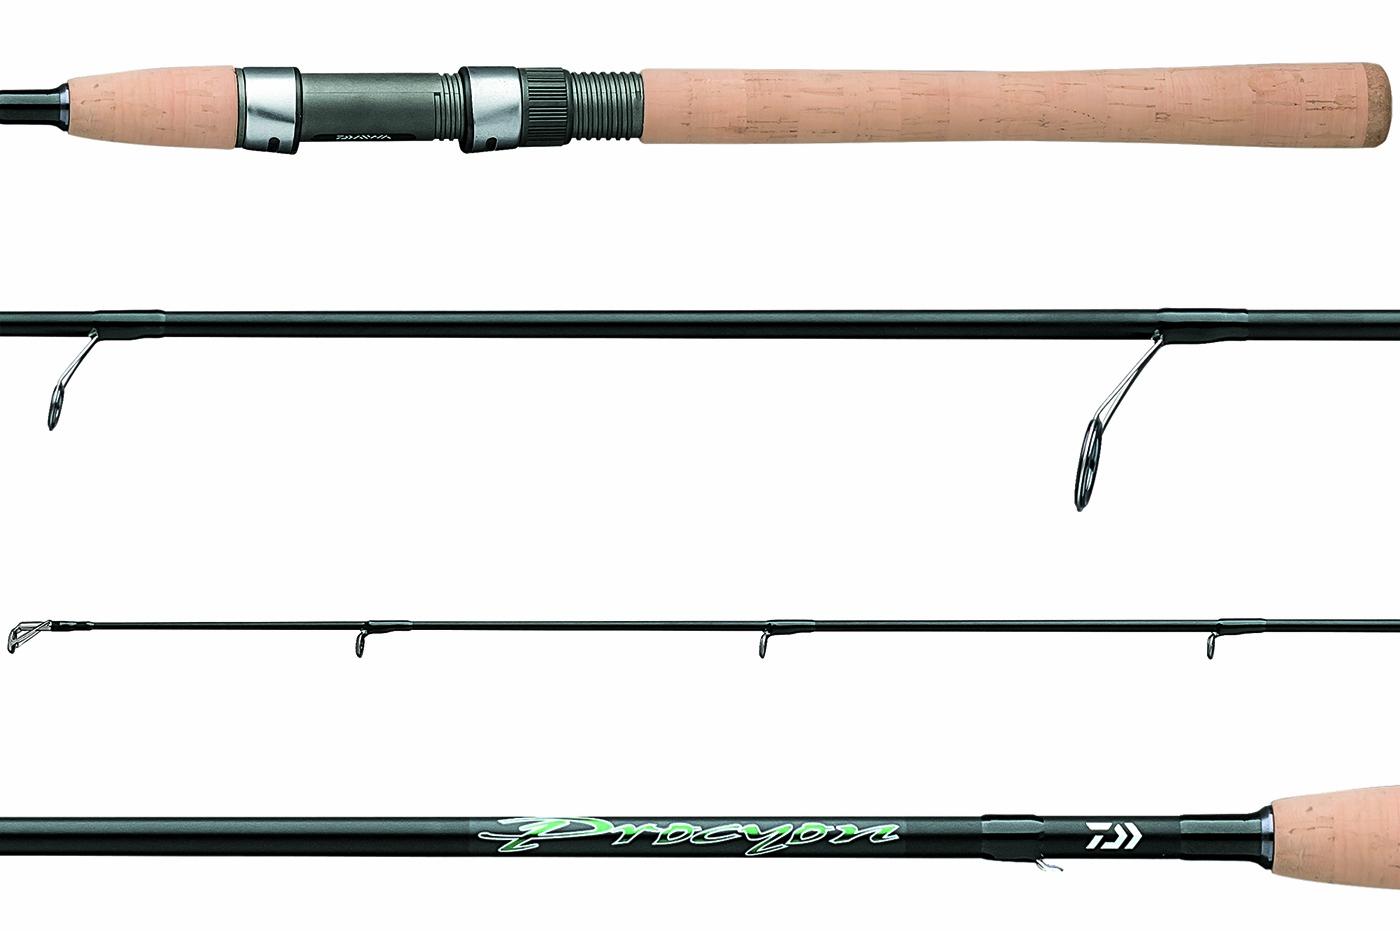 Daiwa procyon inshore spinning rods tackledirect for Daiwa fishing rods